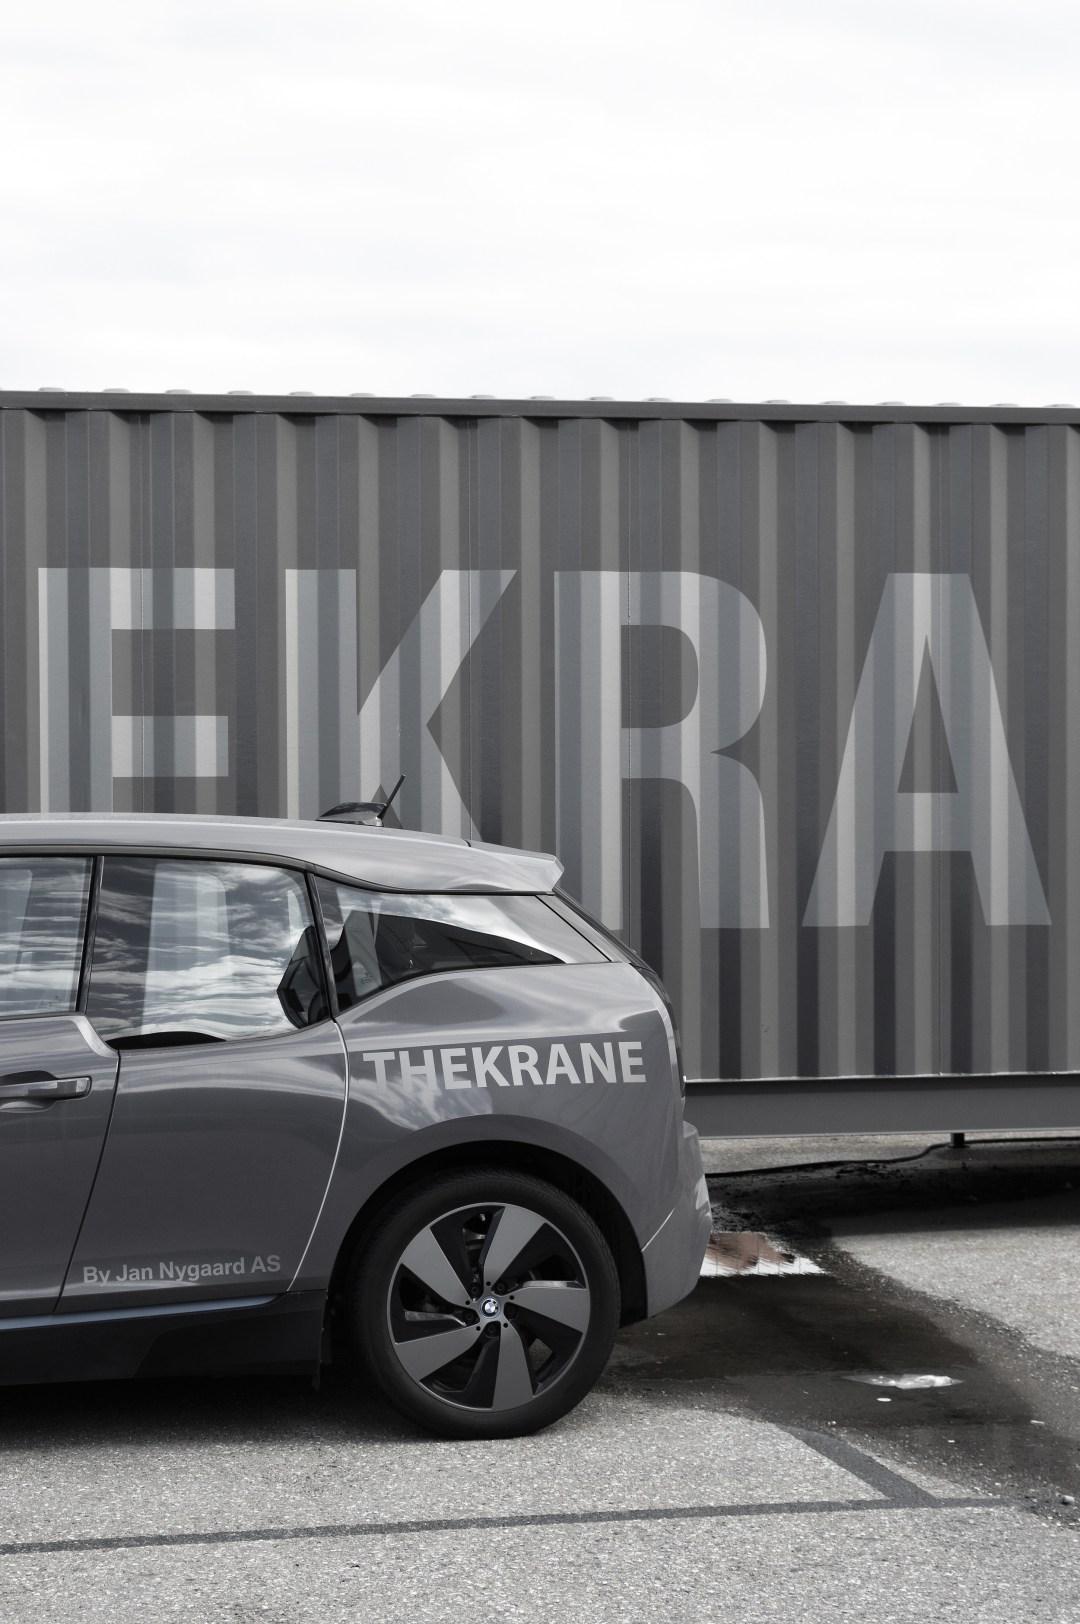 The Krane Copenhagen